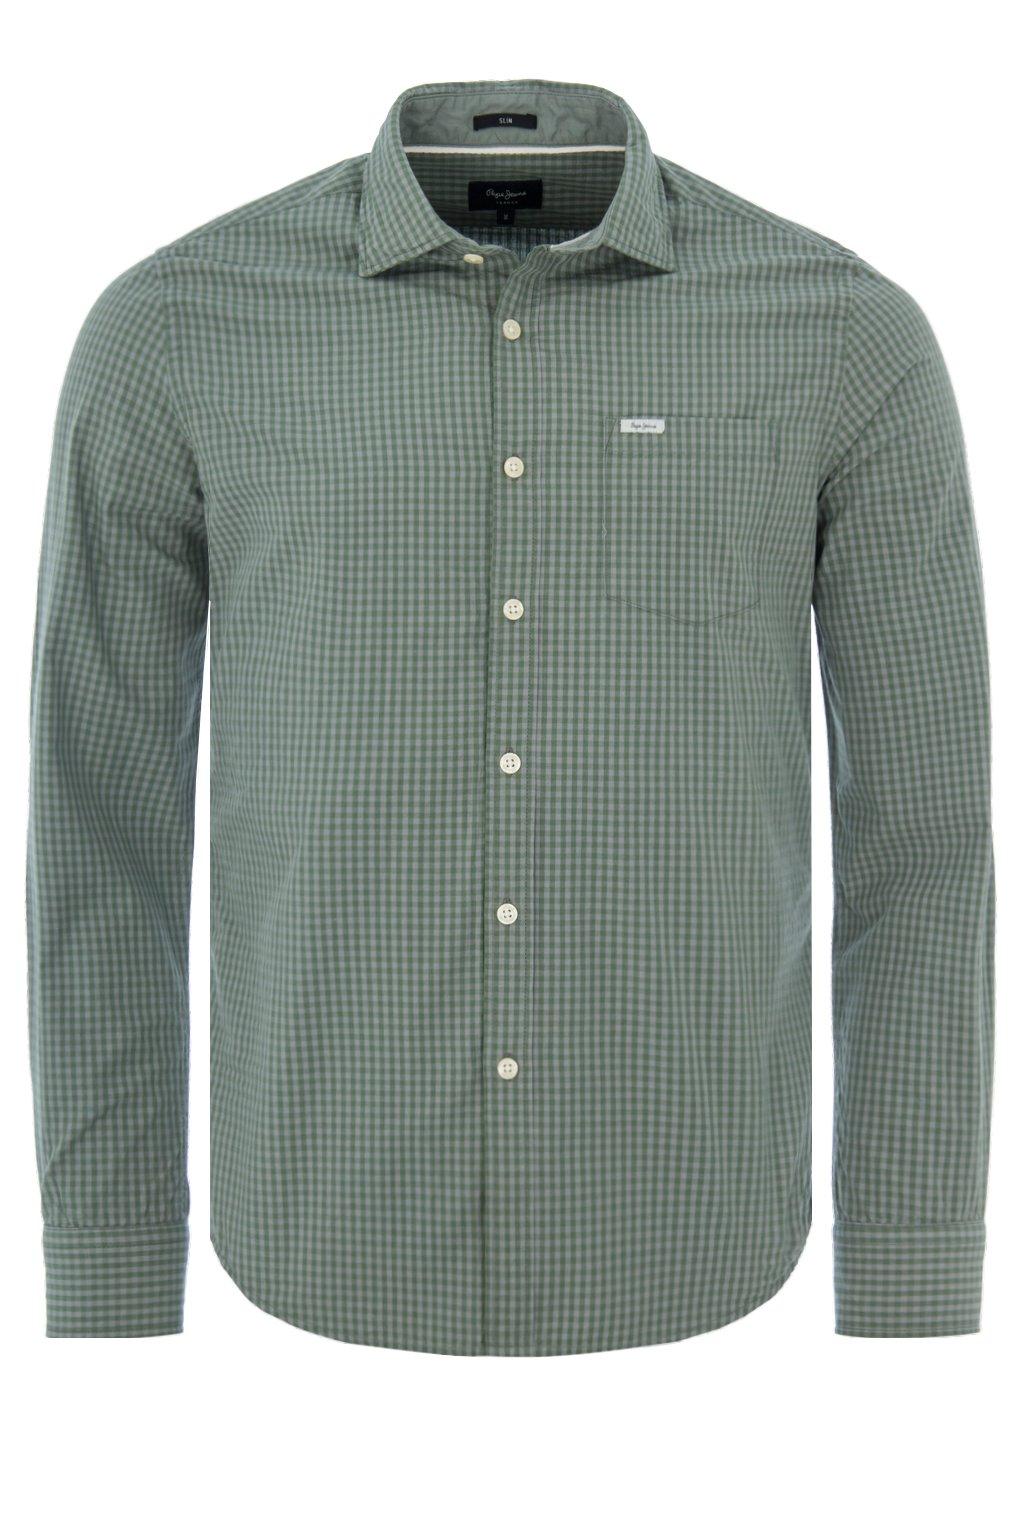 Košile Pepe Jeans PM305476 JACKVILLE